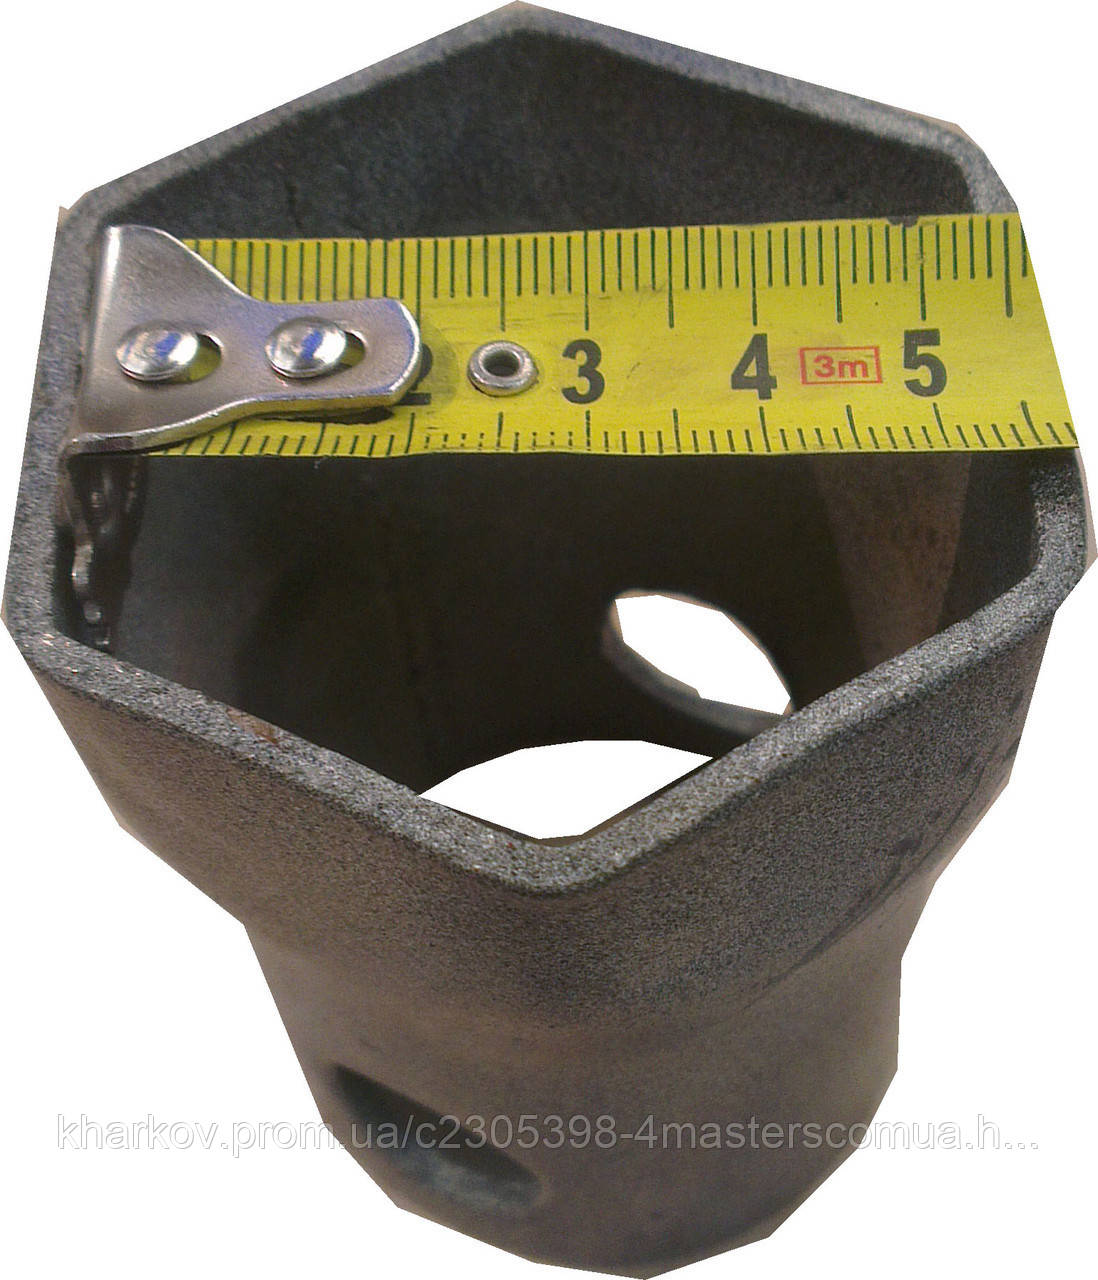 "Торцевая головка под резьбовой фланец тена 1 1/4"" (55мм)"